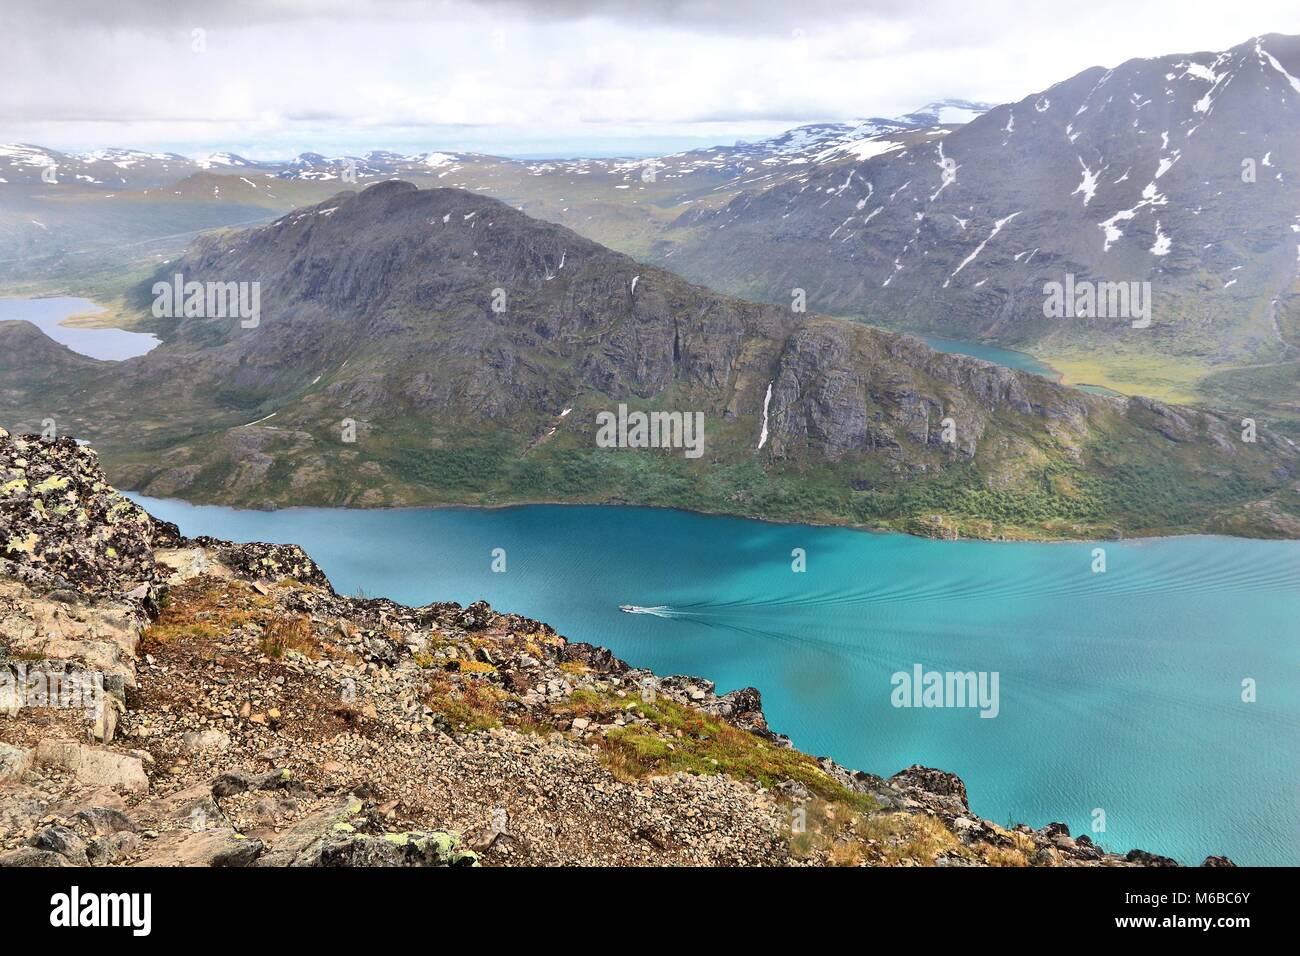 Norway nature - Jotunheimen National Park. Besseggen ridge trail between two lakes (Gjende and Bessvatnet). Oppland - Stock Image